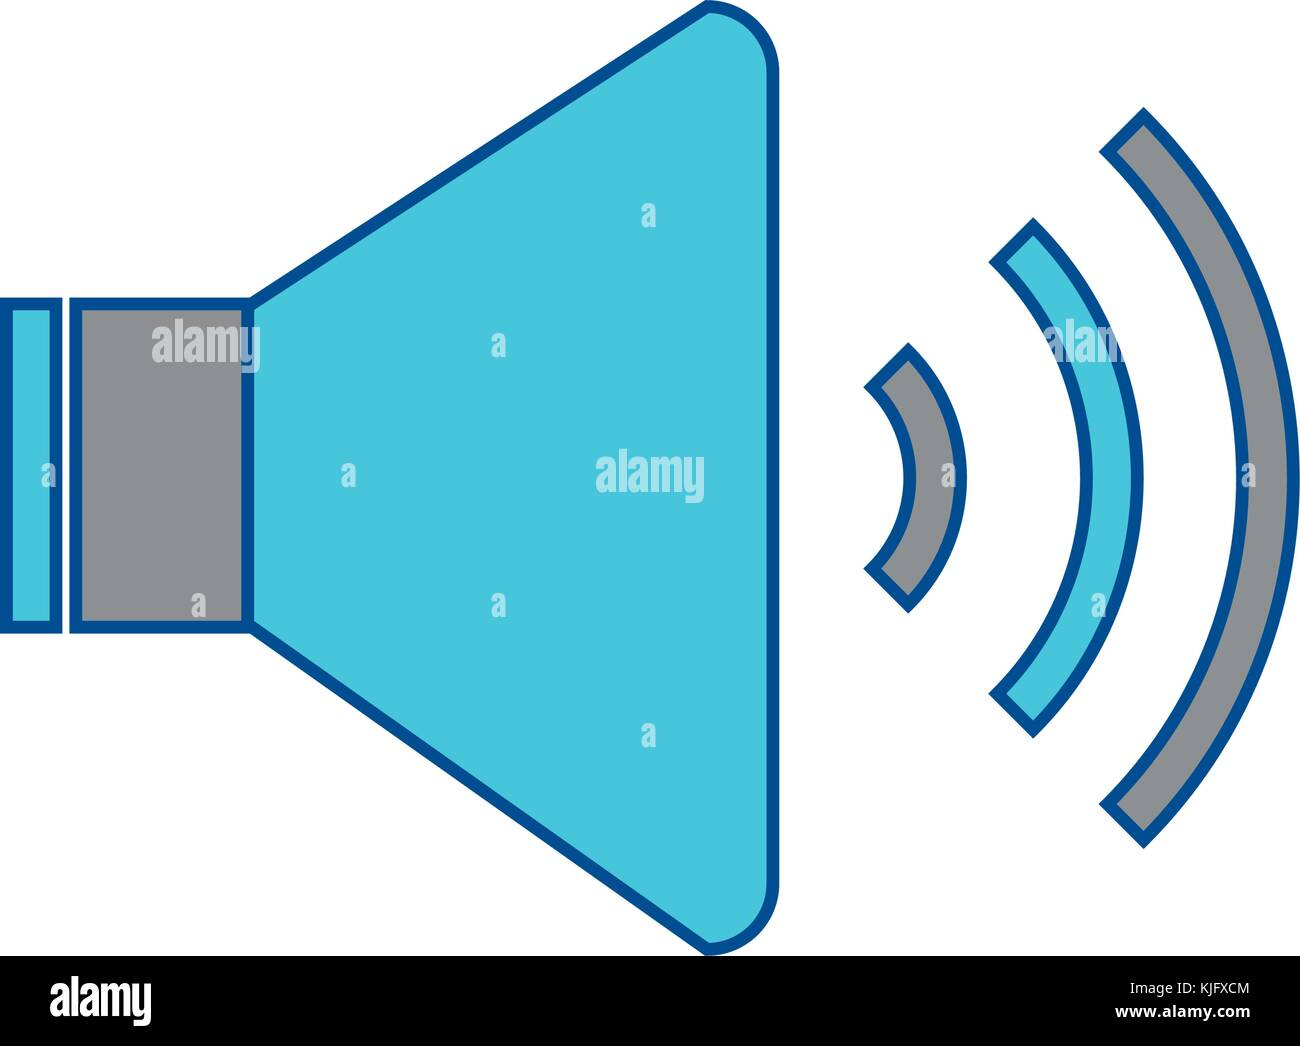 speaker sound on icon image Stock Vector Art & Illustration, Vector